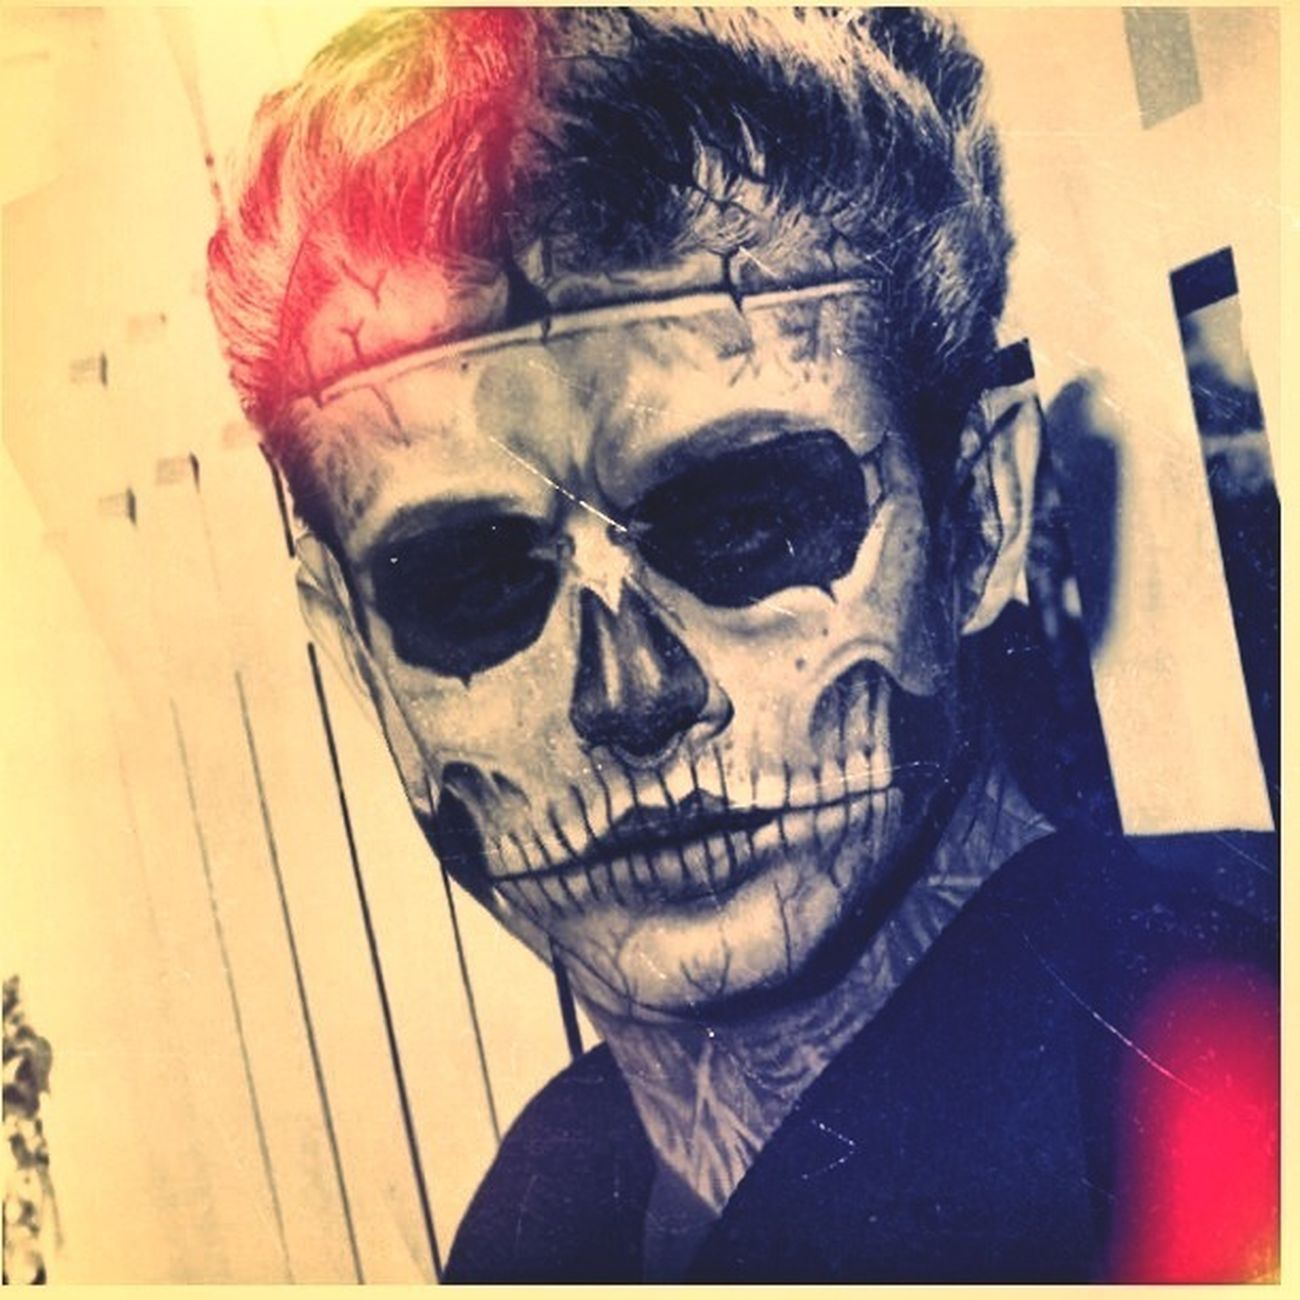 My edit of James Dean